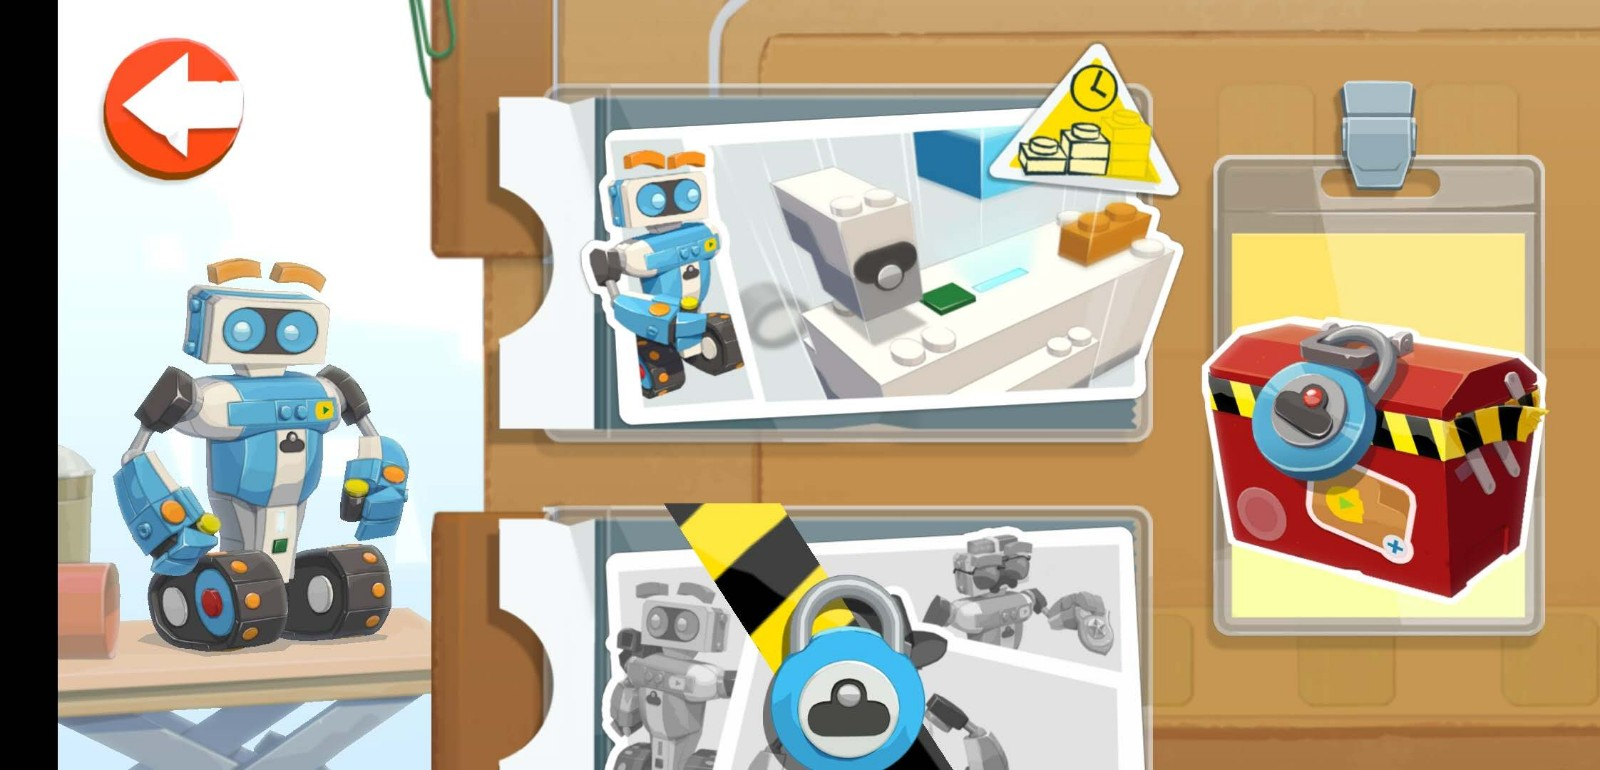 Dynamsoft Barcode Reader教程:使用Lego Boost和Webcam制作条码扫描机器人